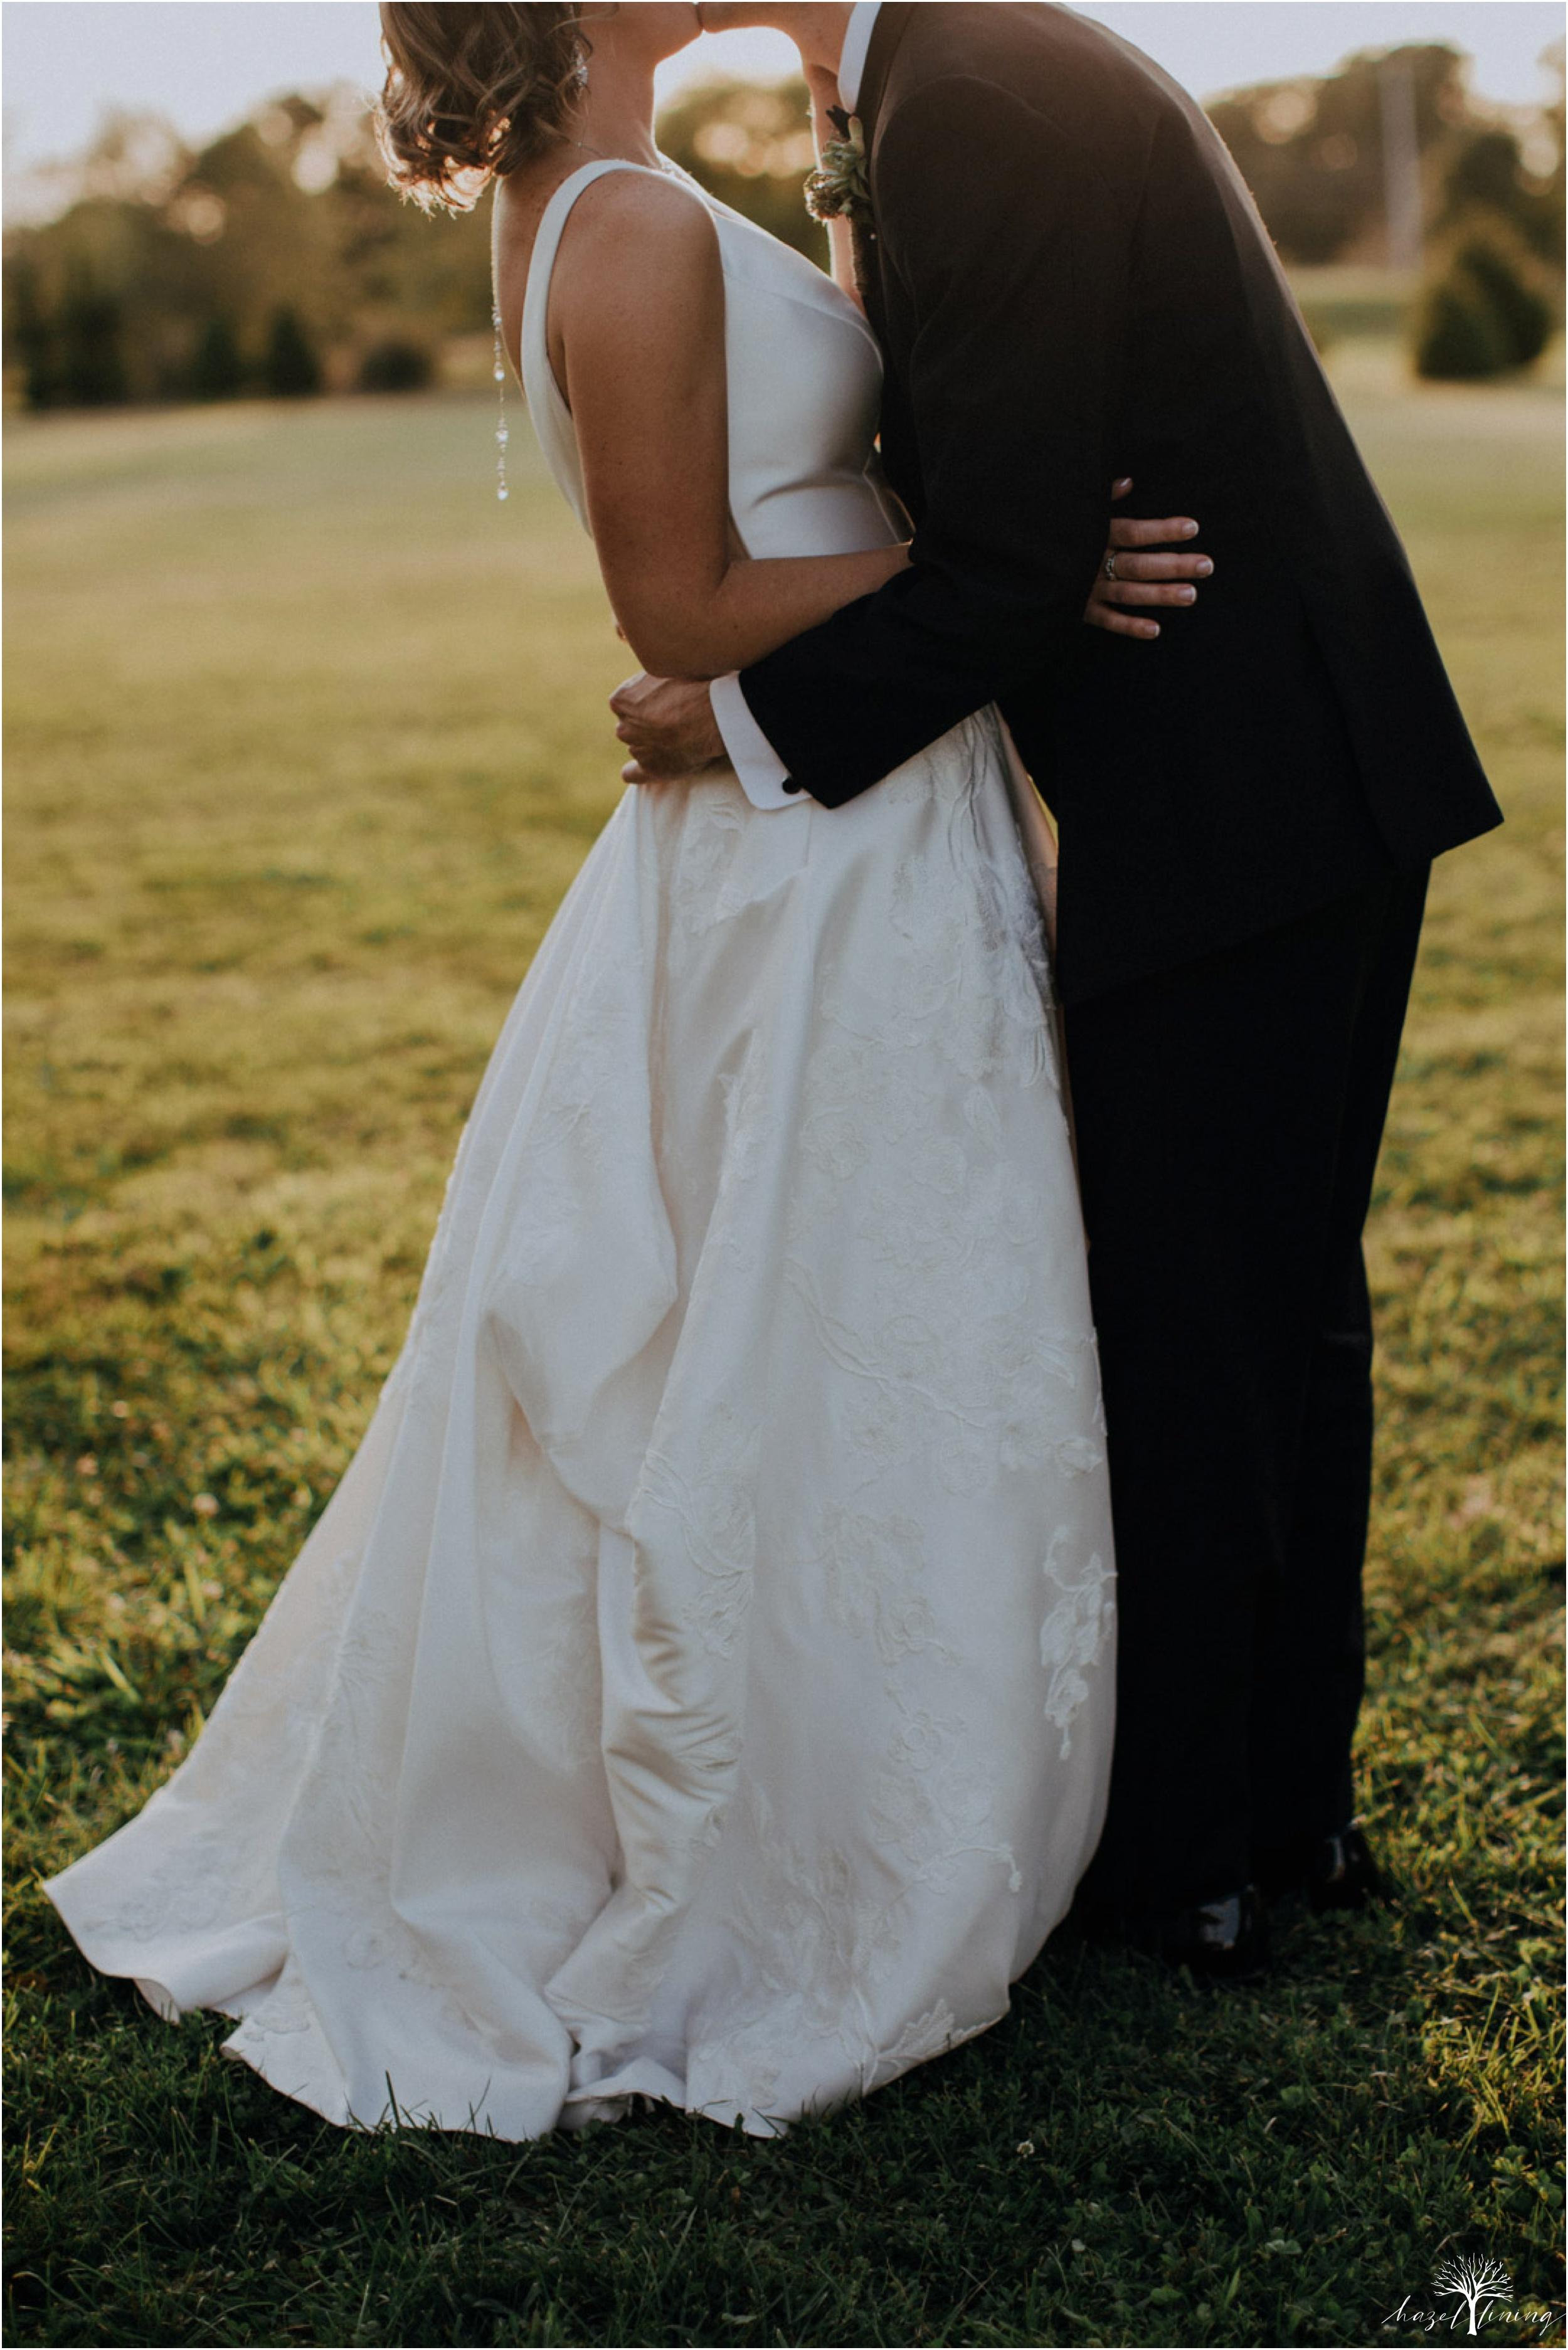 maureen-hepner-anthony-giordano-rose-bank-winery-newtow-pennsylvania-luxury-summer-wedding-hazel-lining-photography-destination-elopement-wedding-engagement-photography_0167.jpg